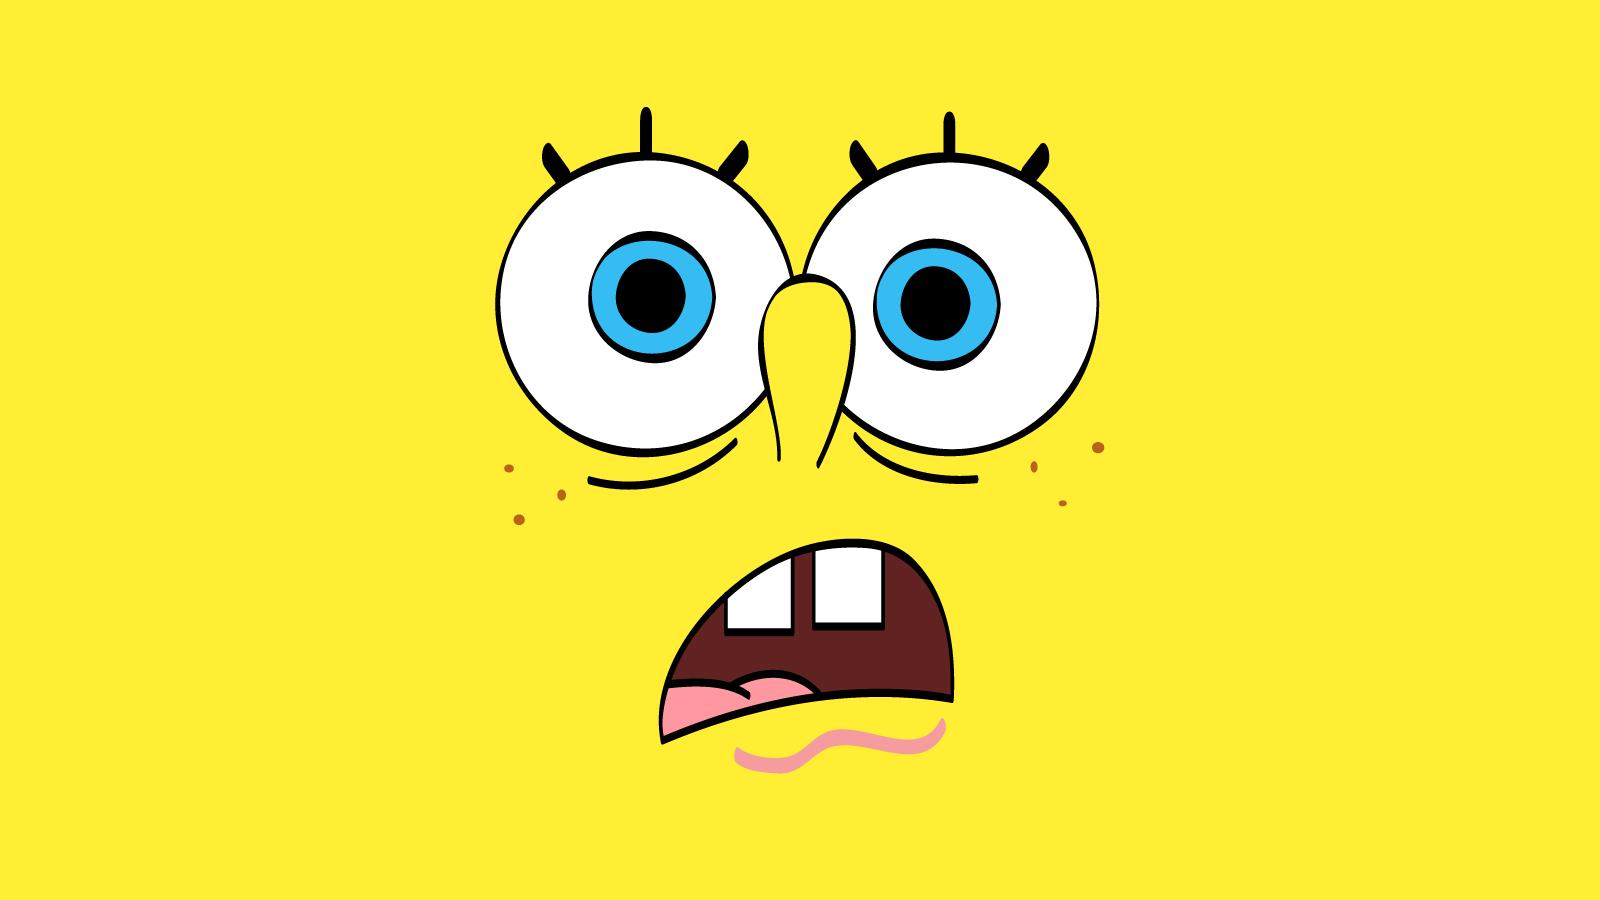 1600x900 Funny Cartoon Spongebob Sad Face Yellow Wallpa